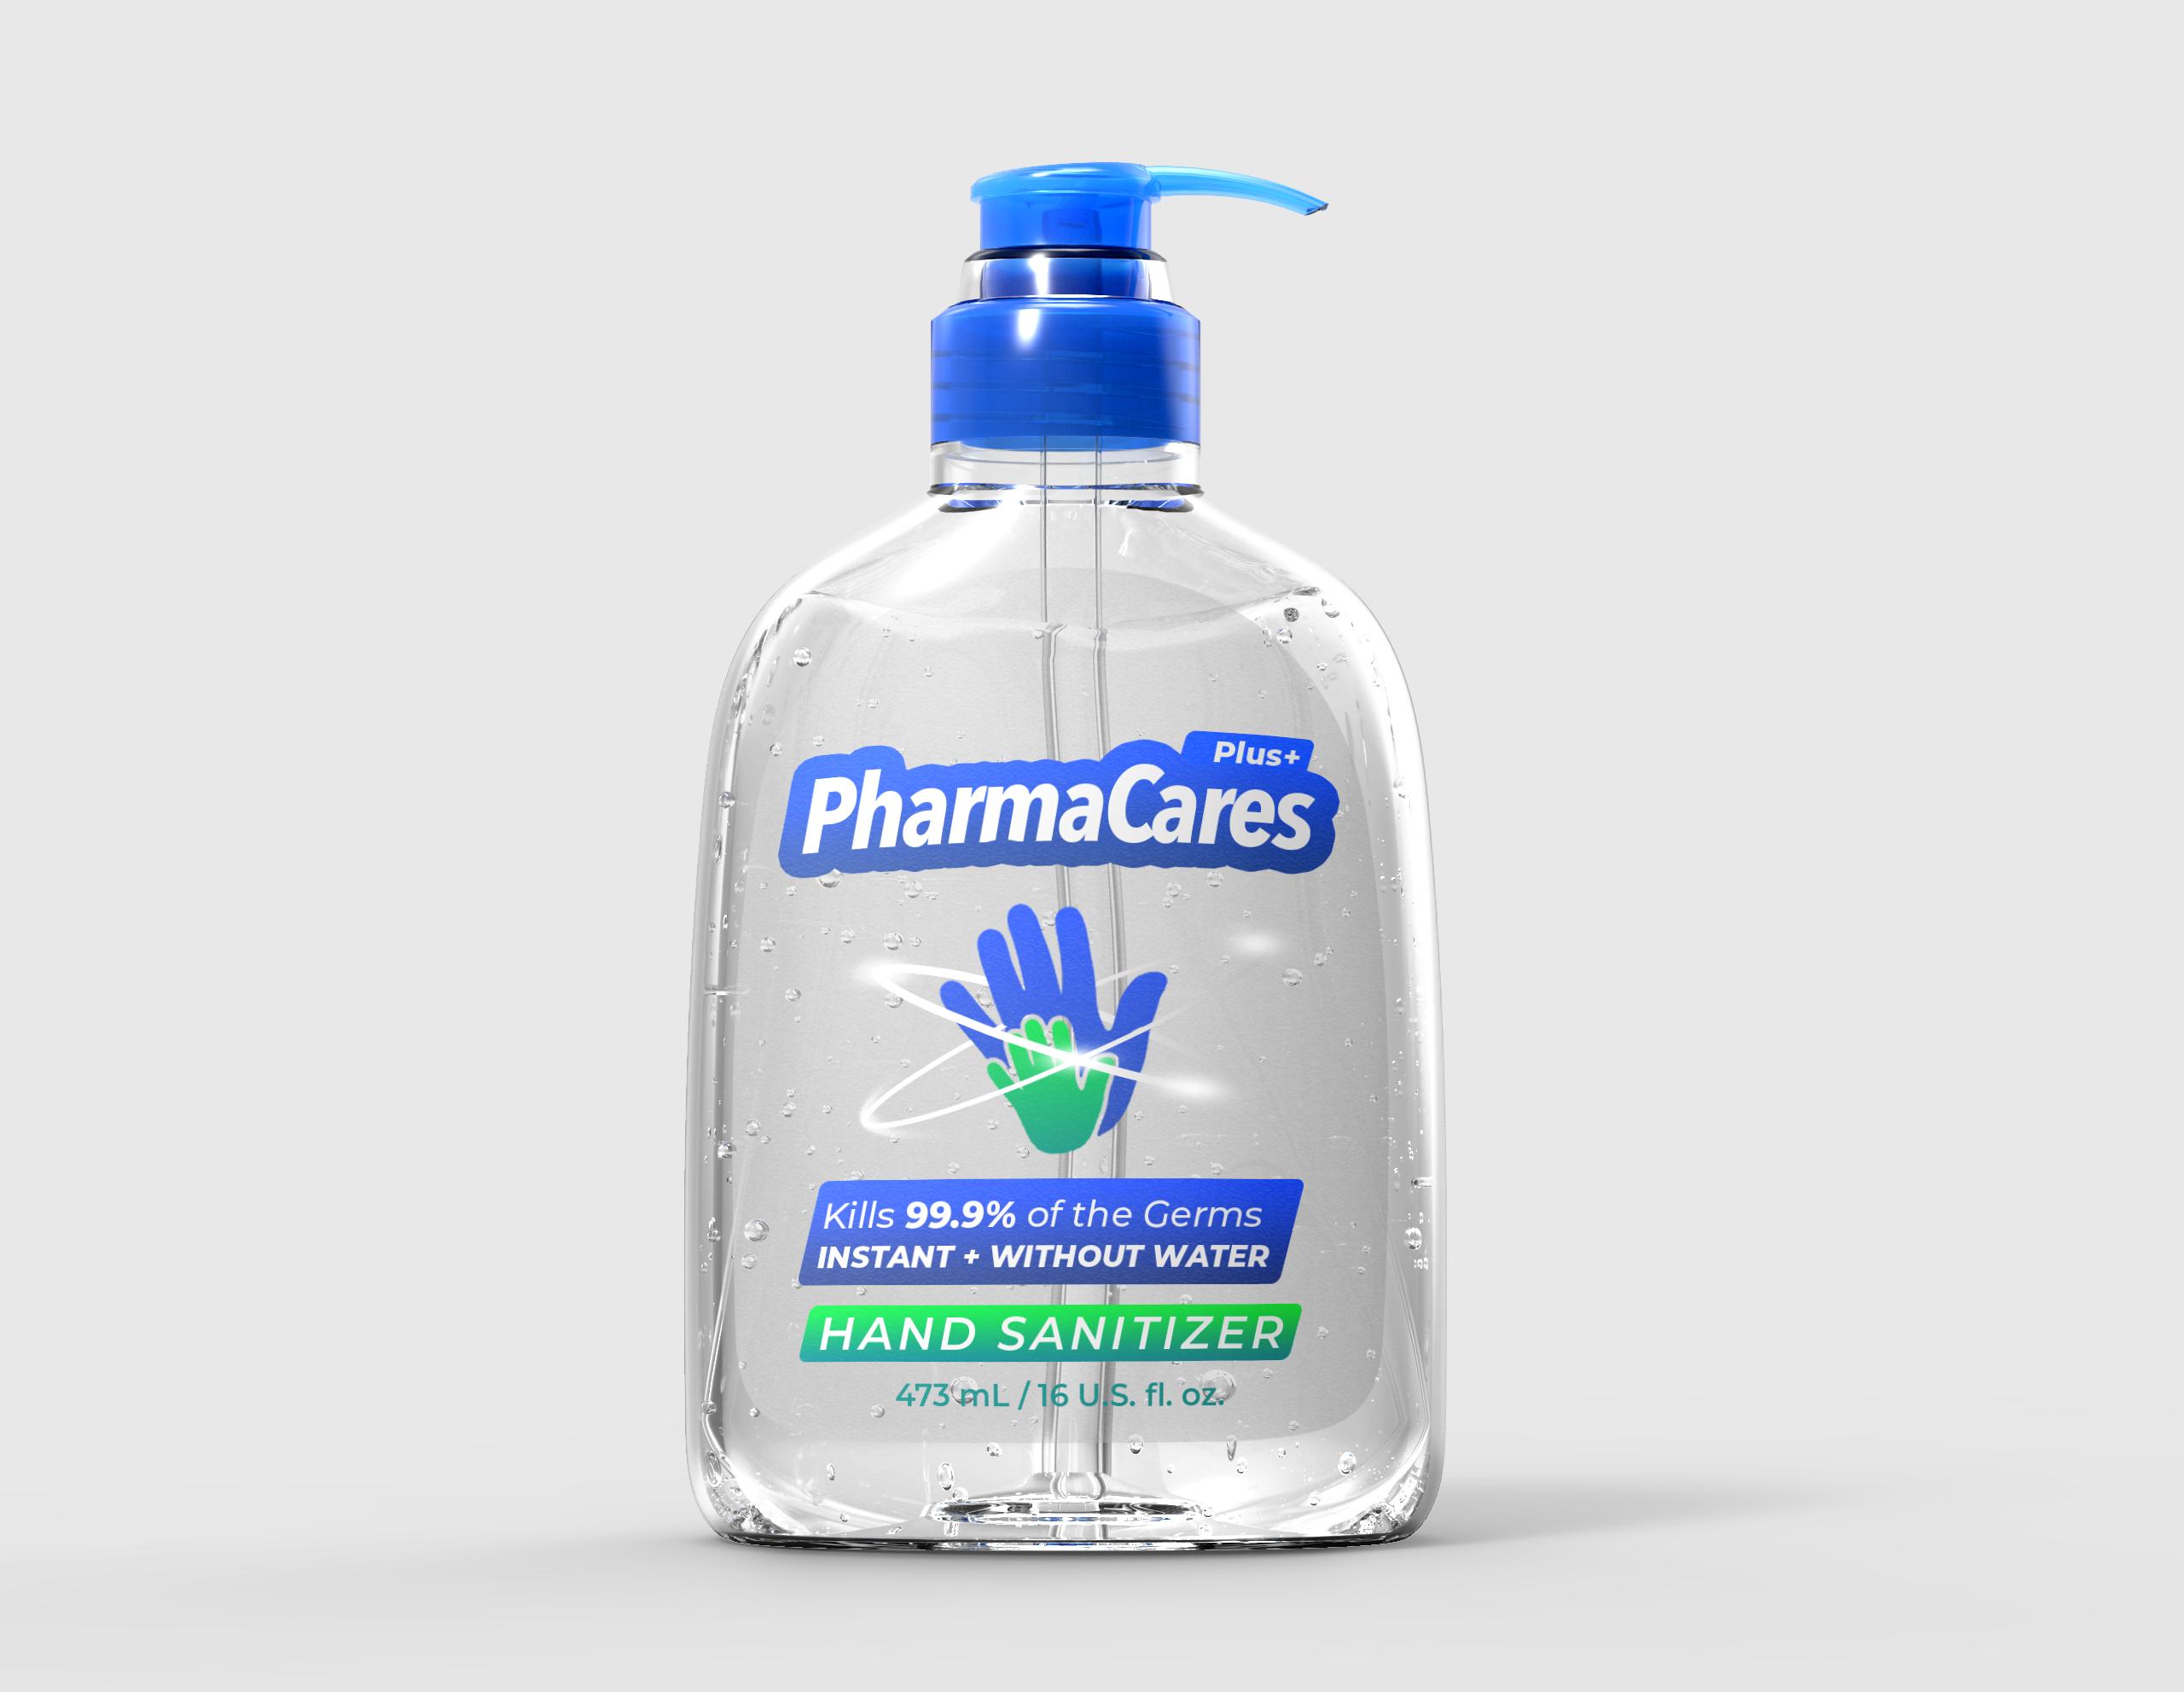 PharmaCares Hand Sanitizer